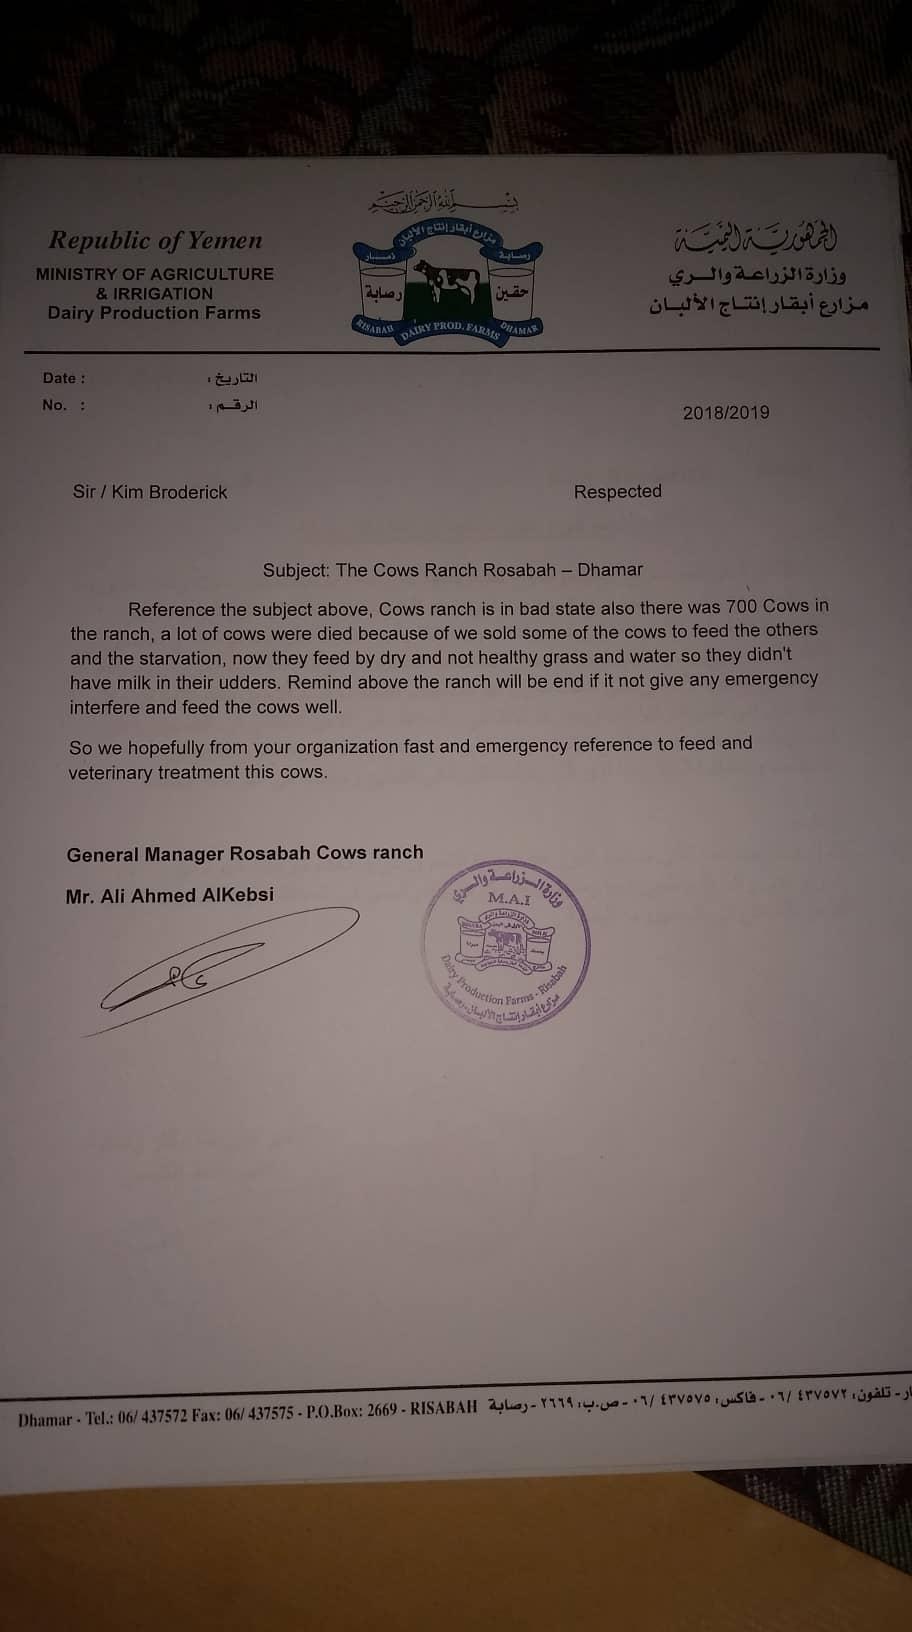 Dhamar rosabah farm letter of Request for relief aid assistance 4 Nov 2018 for OWAP AR Hisham Al hoot visit.jpg